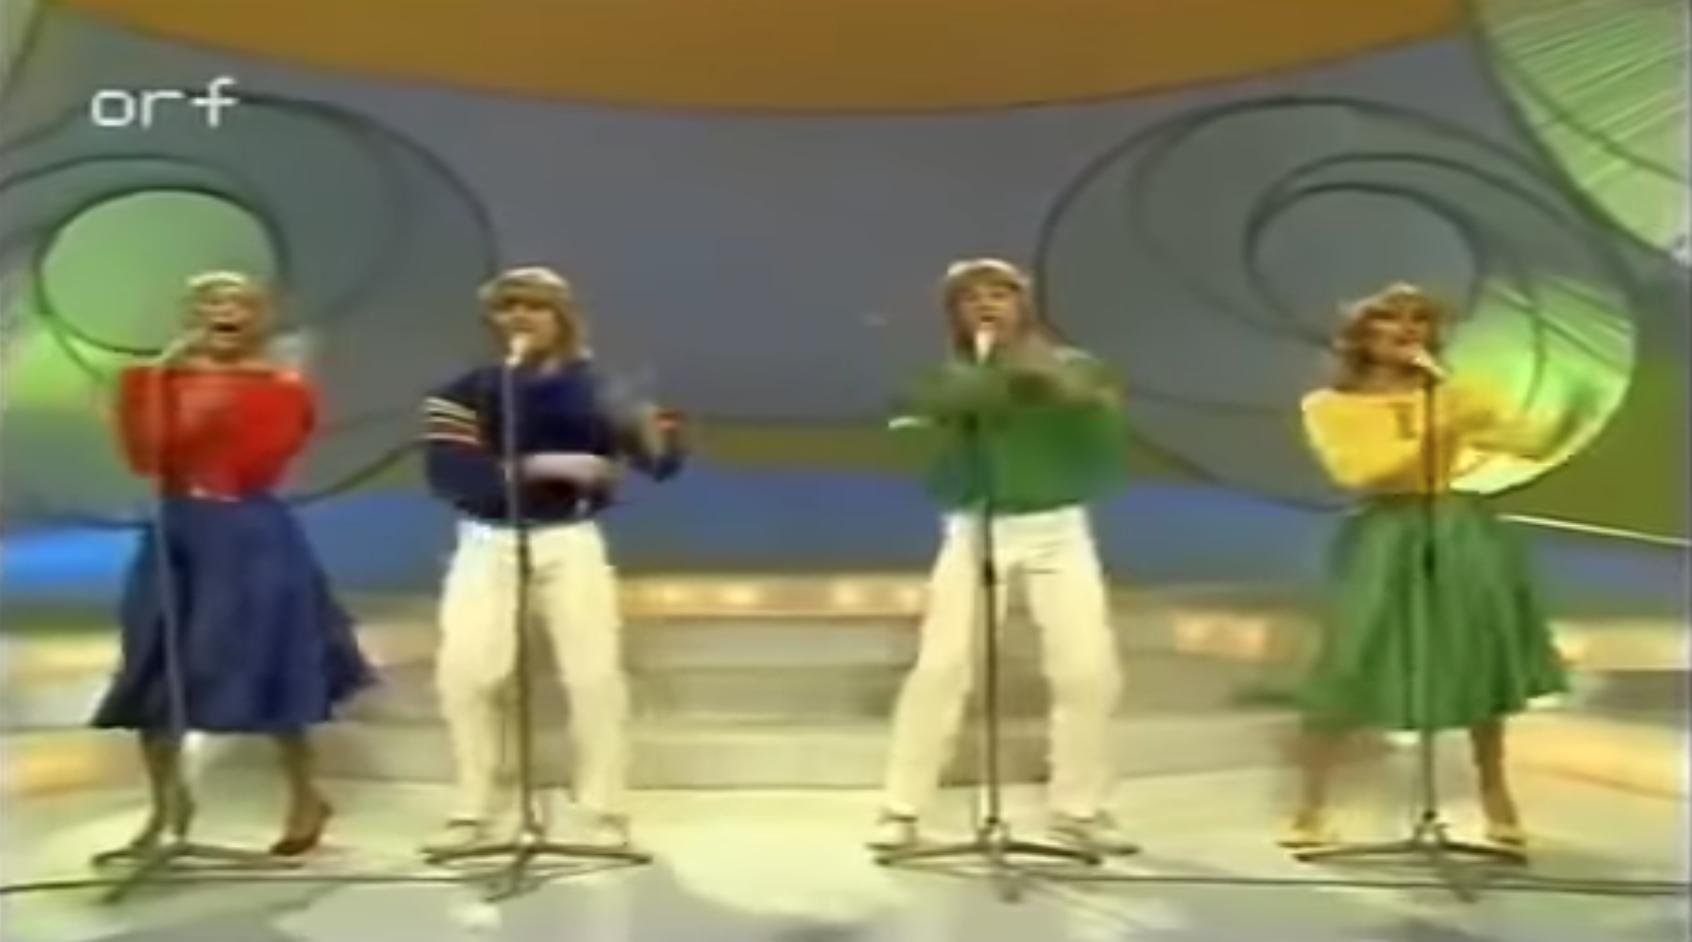 Bucks Fizz Eurovision